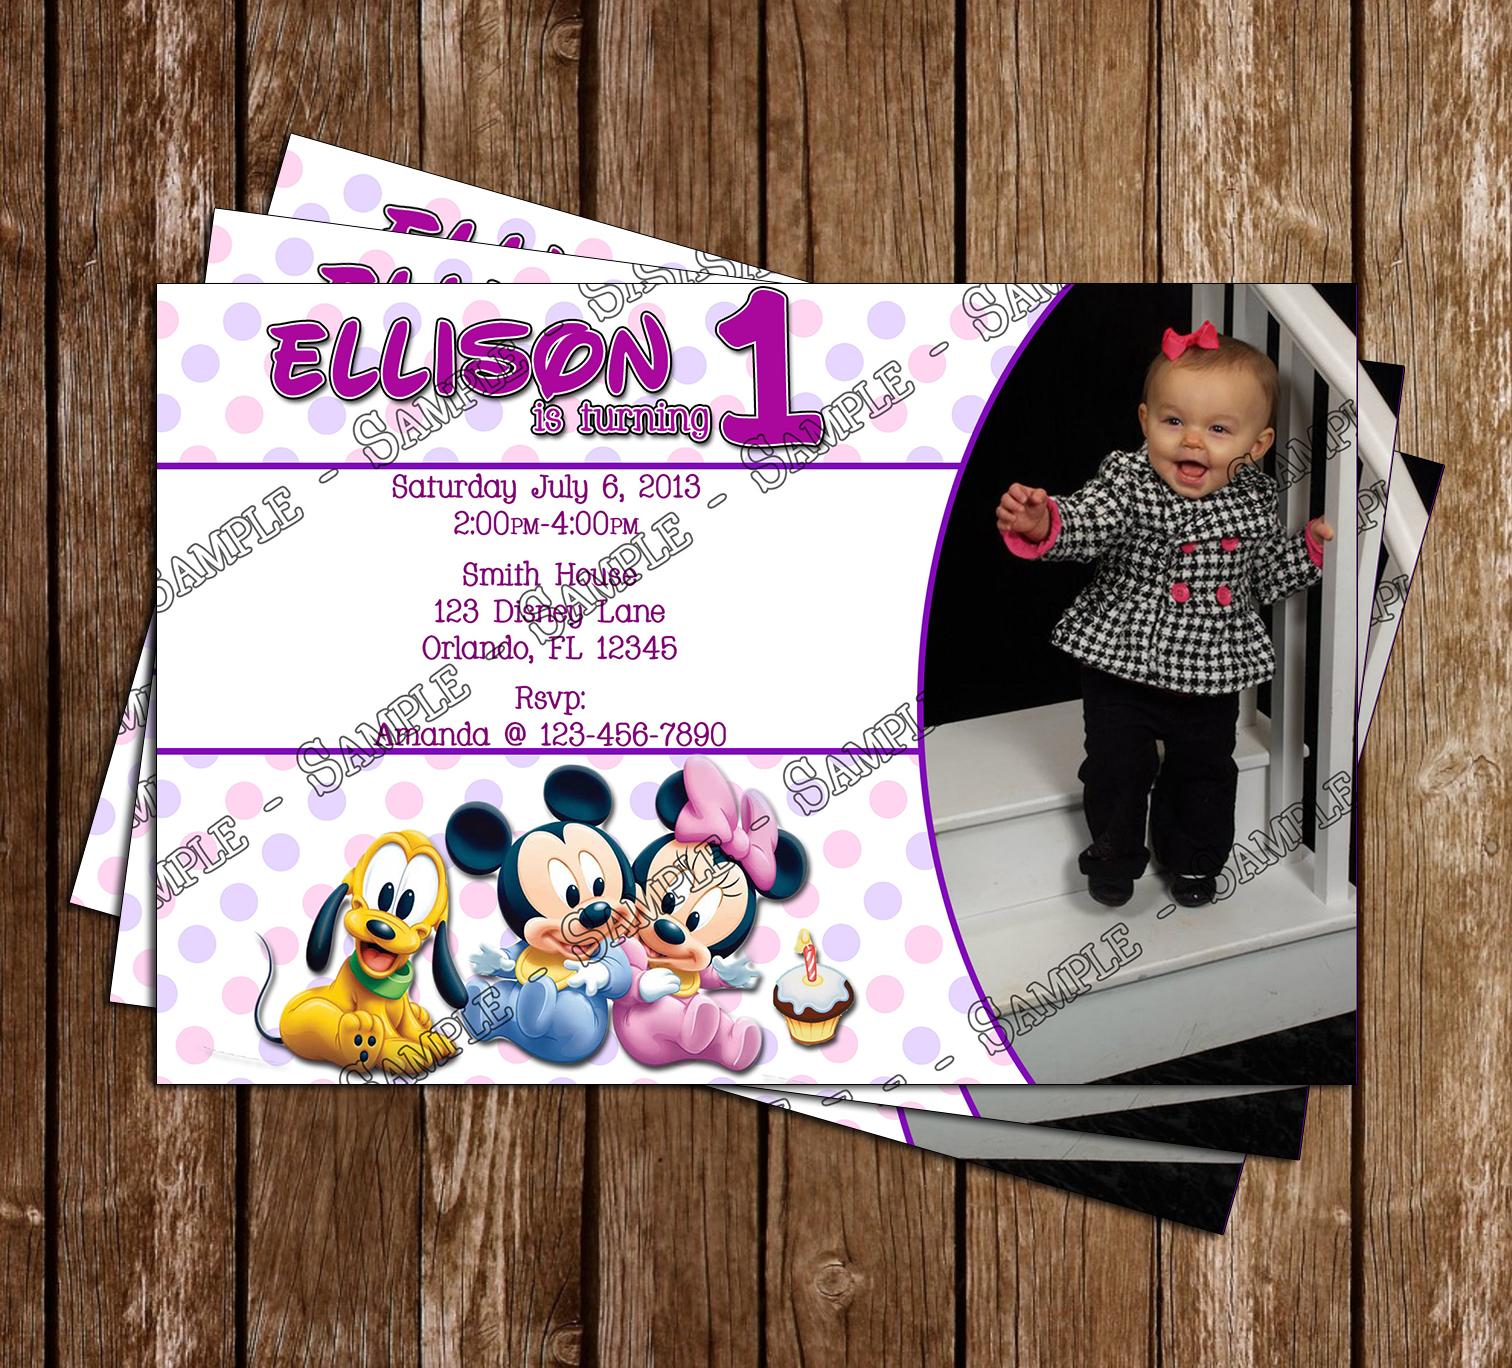 Disney Baby Mickey 1st Birthday Invitation And Thank You Card July 07 2013